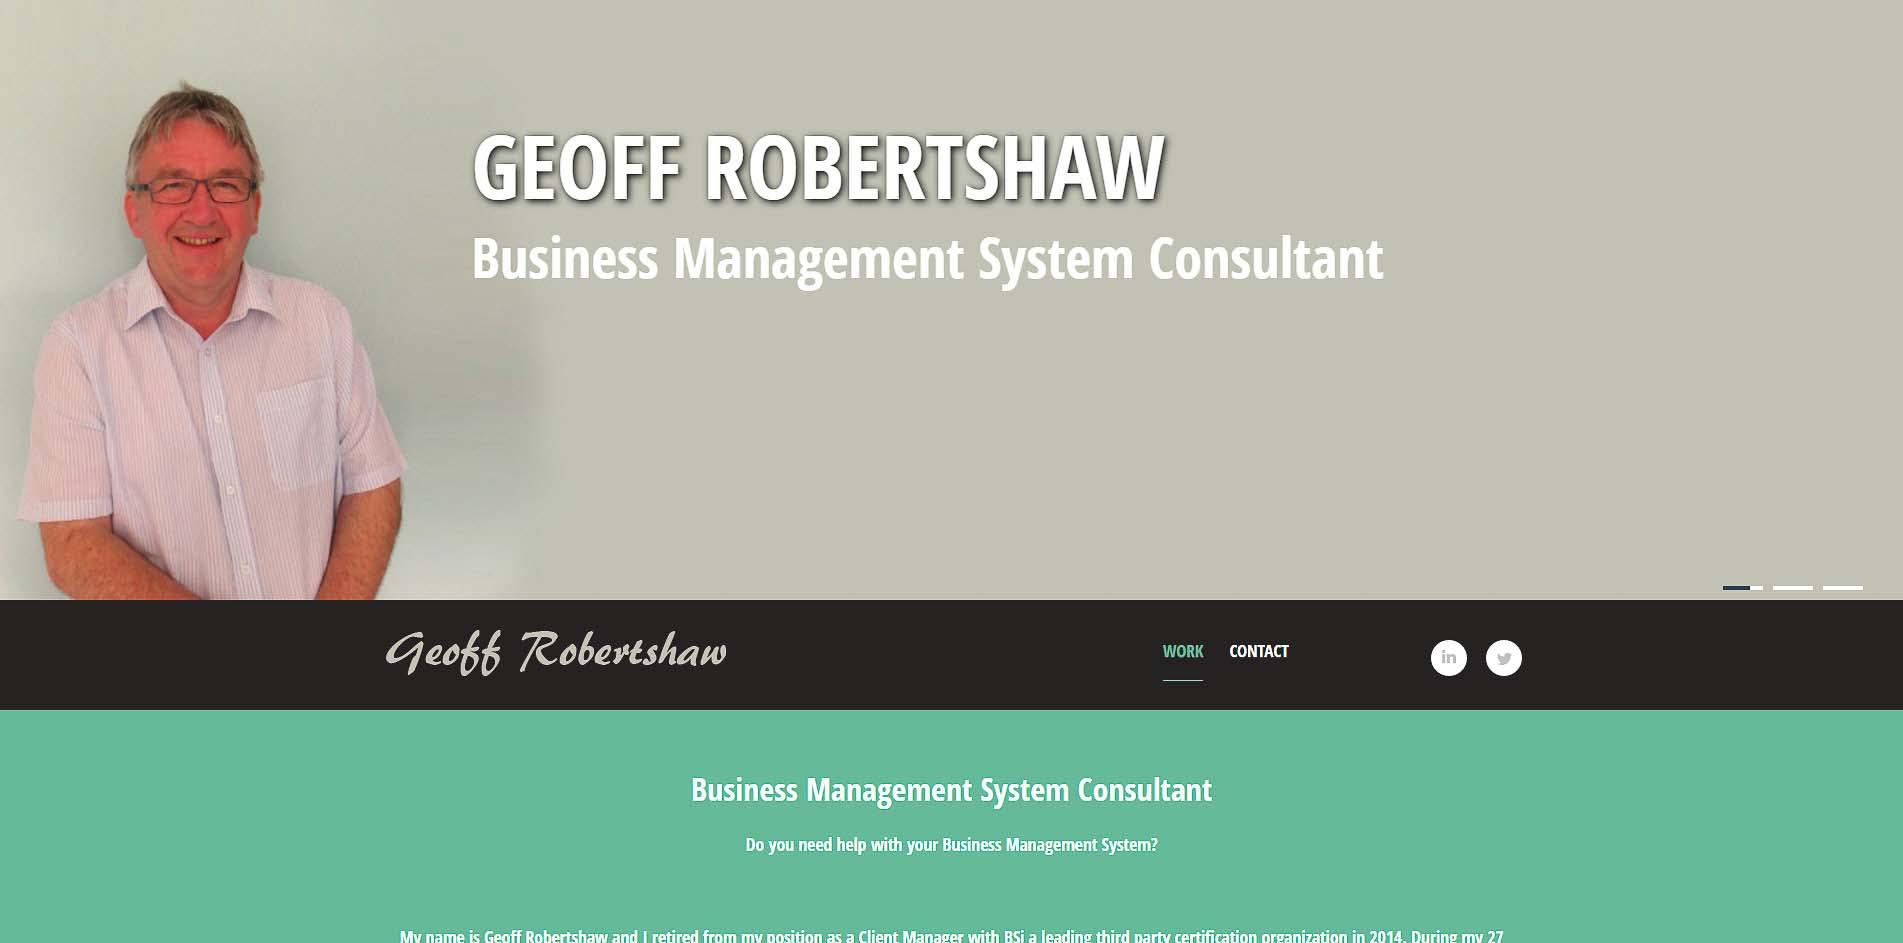 Geoff Robertshaw